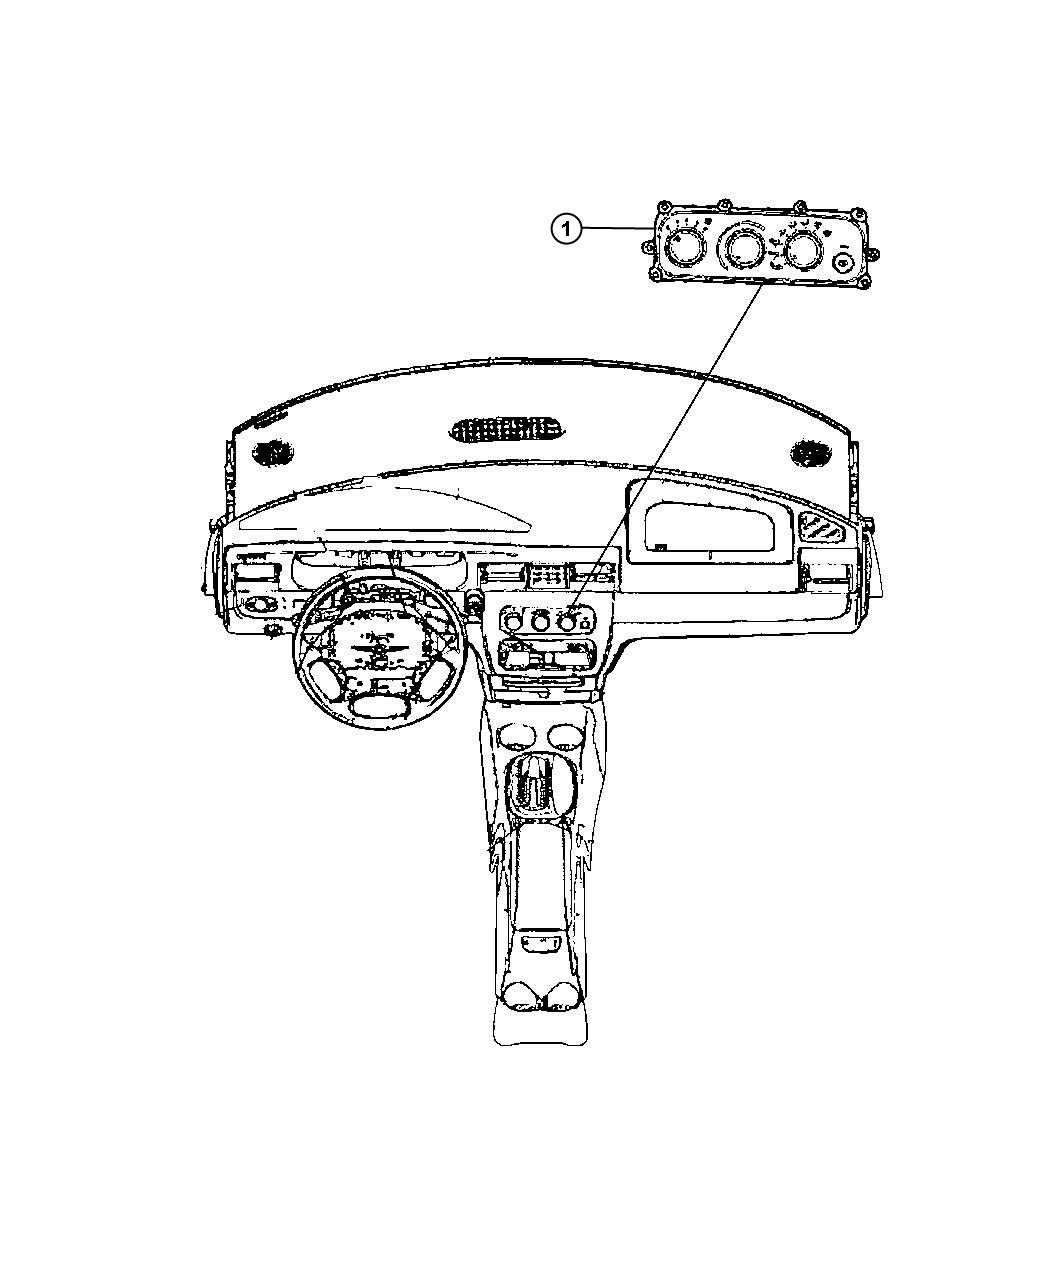 1946 Chevy Truck Wiring Diagram